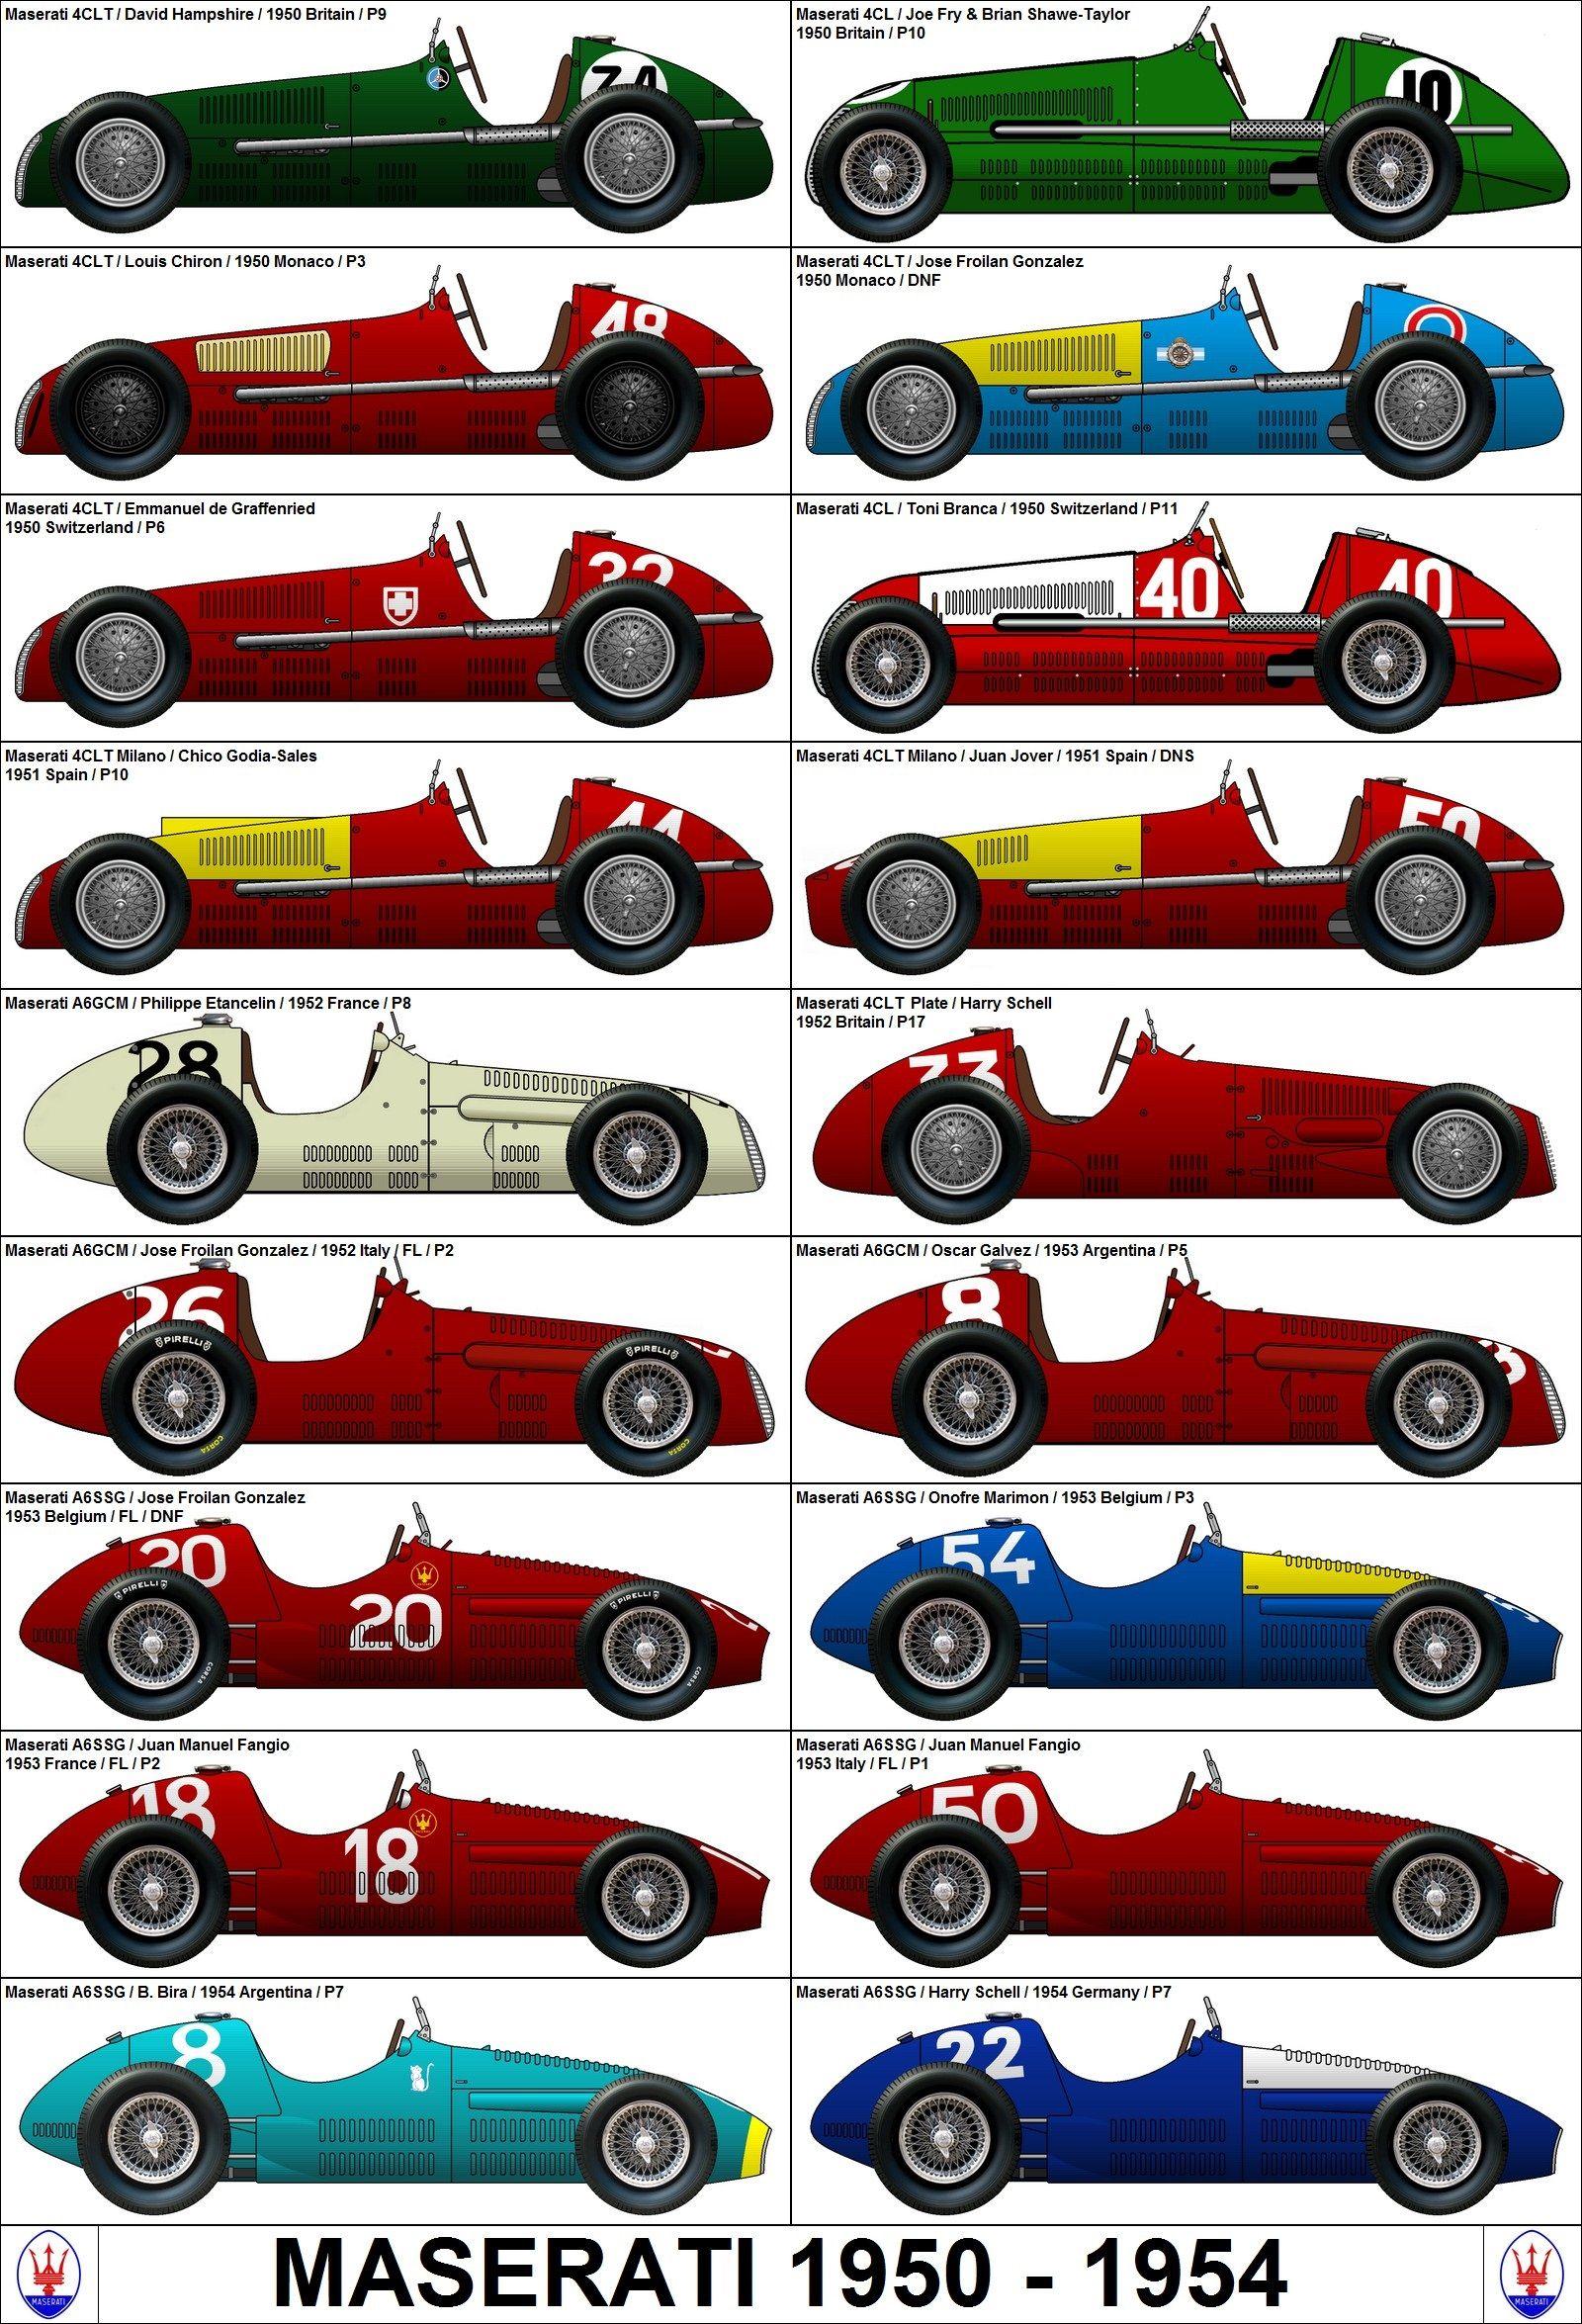 Formula One Grand Prix Maserati 1950 1954 Cars Maserati Ferrari